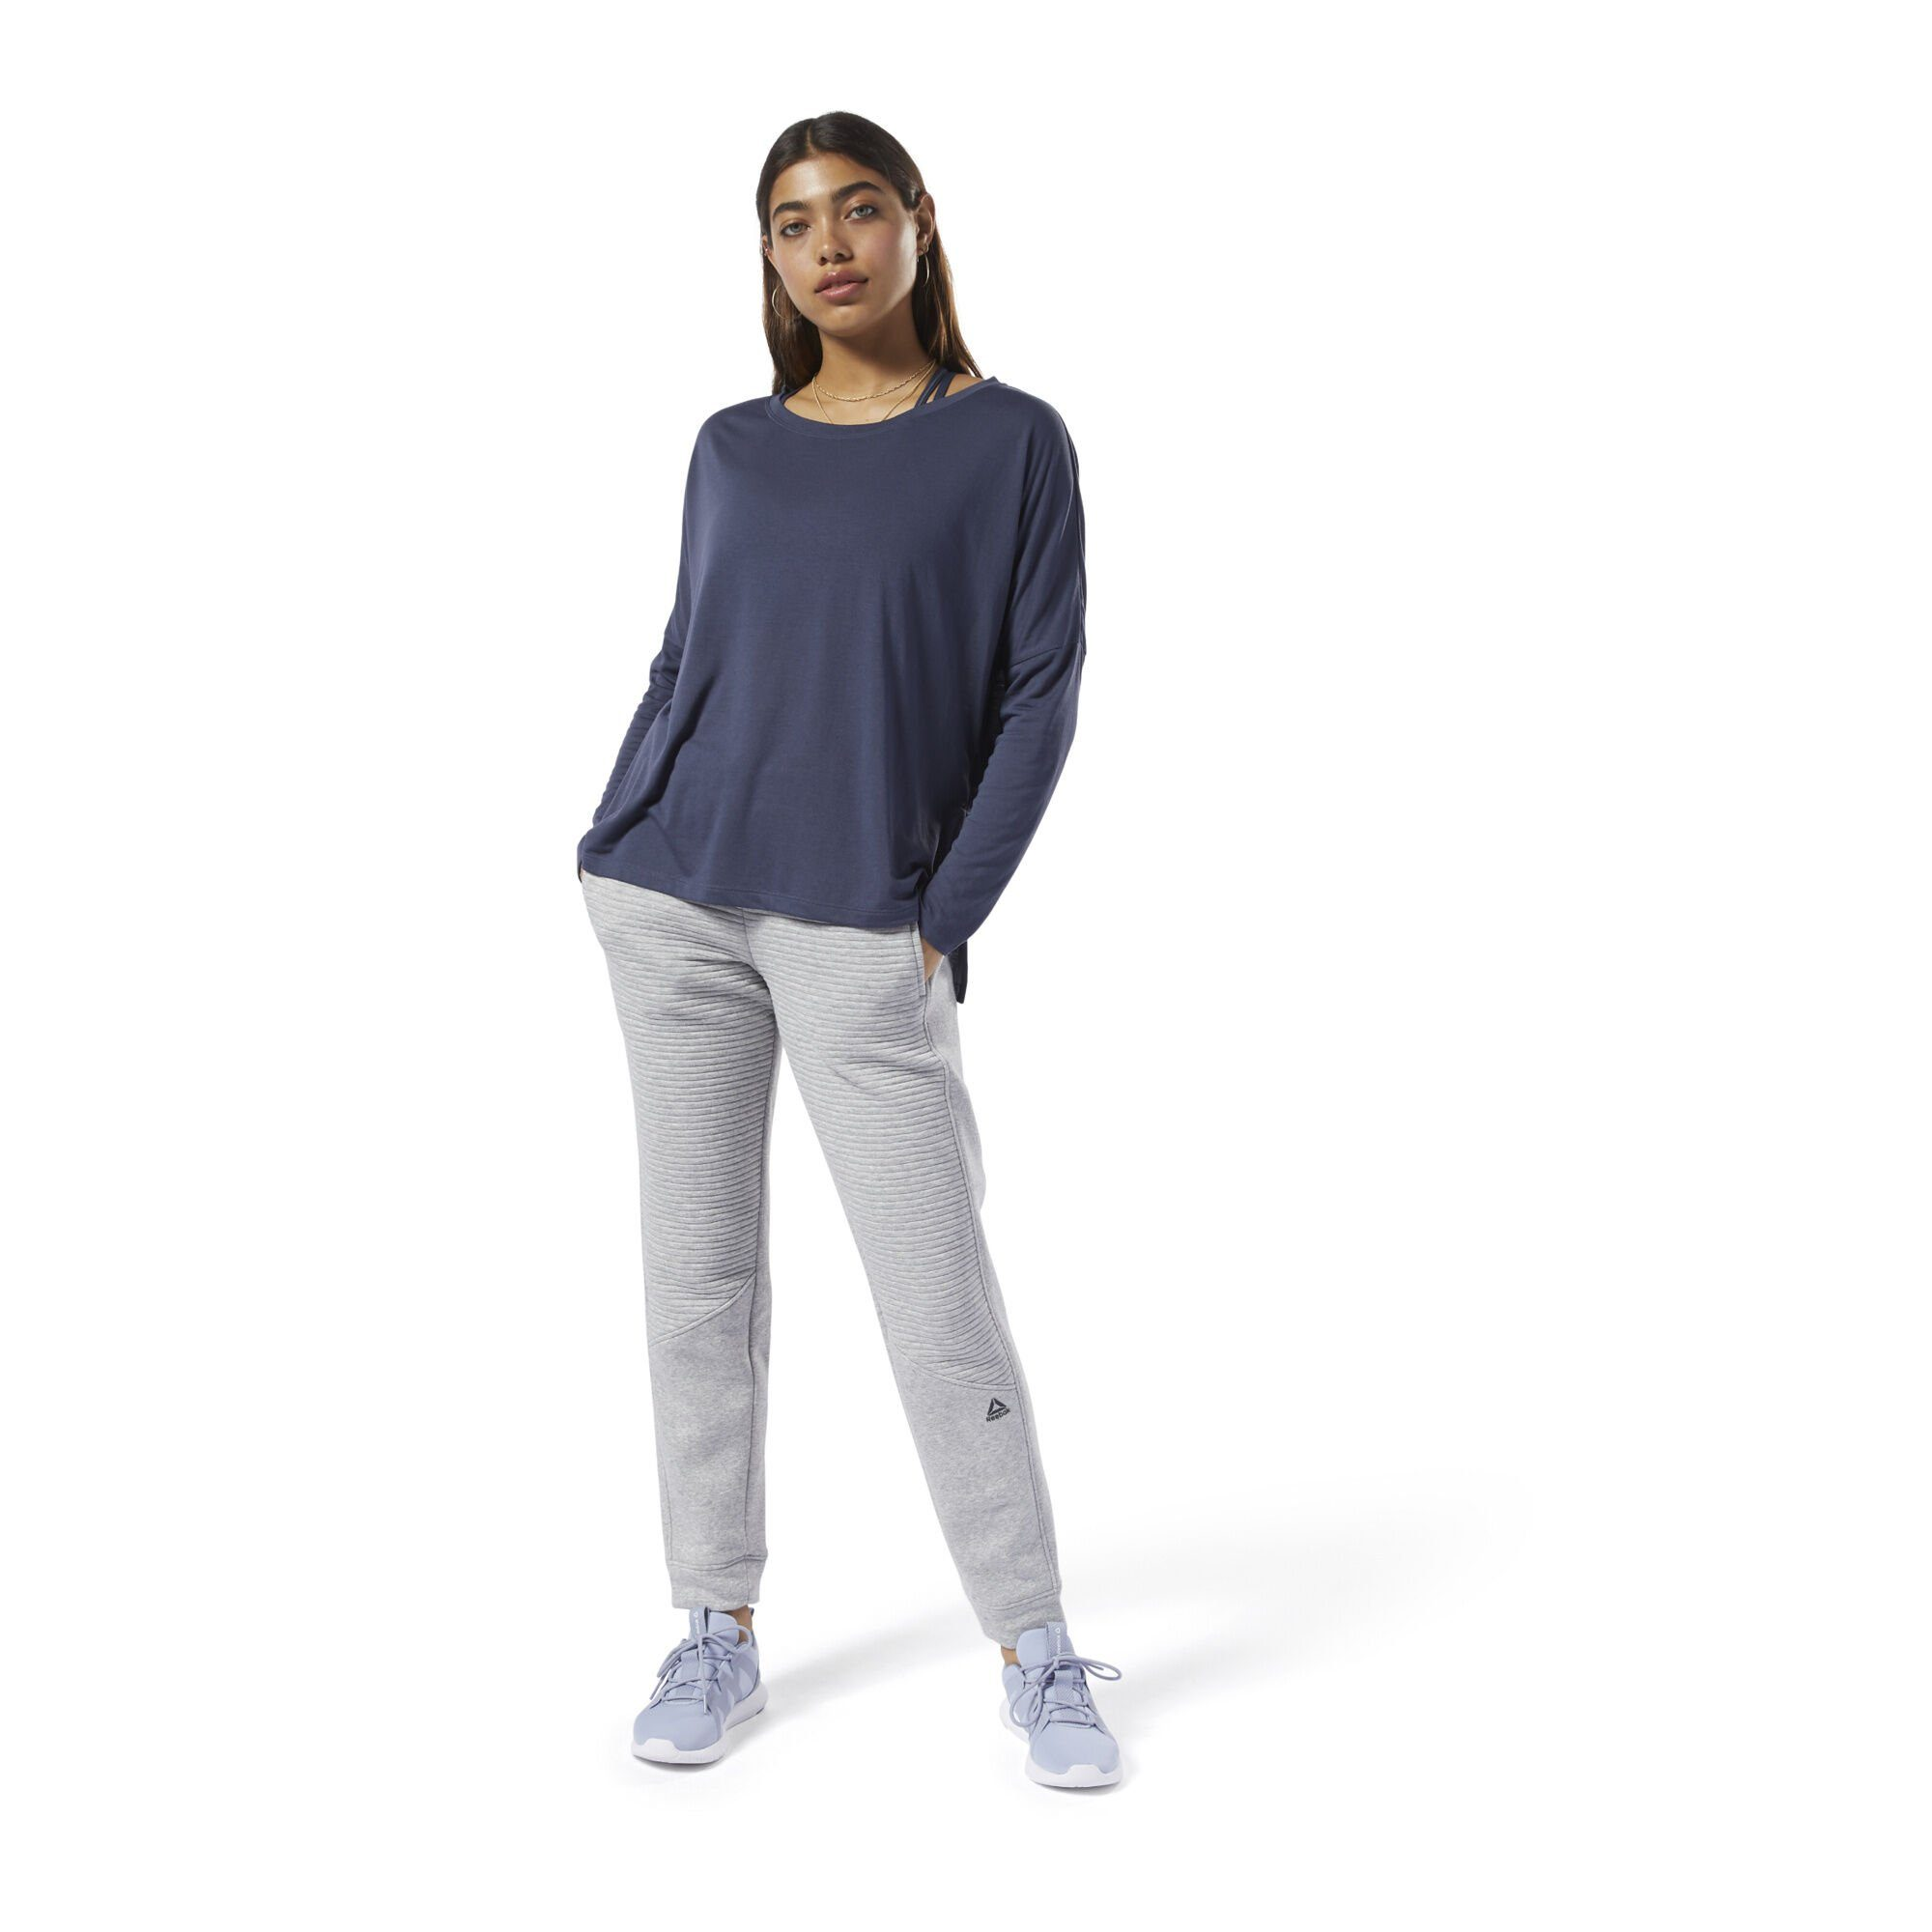 »wor Versatile Sporthose Reebok Kaufen Pant« kulOPXZiTw